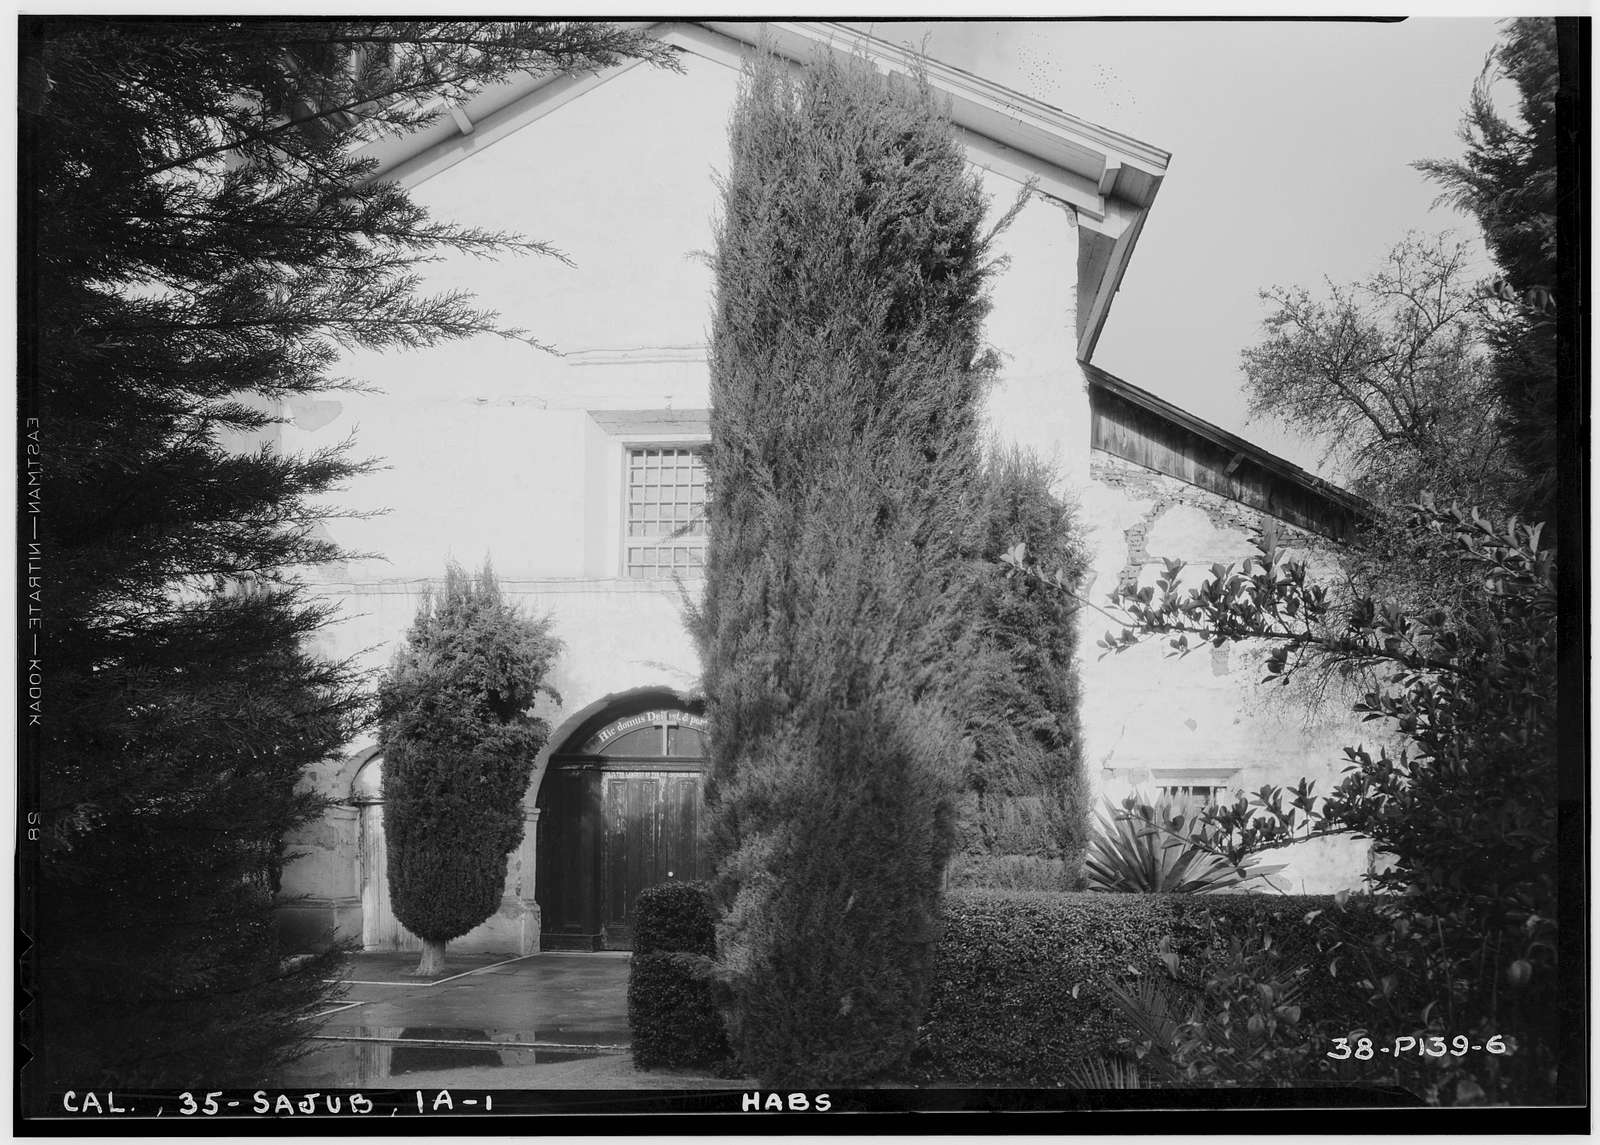 Mission San Juan Bautista, Church, Second Street, San Juan Bautista Plaza, San Juan Bautista, San Benito County, CA